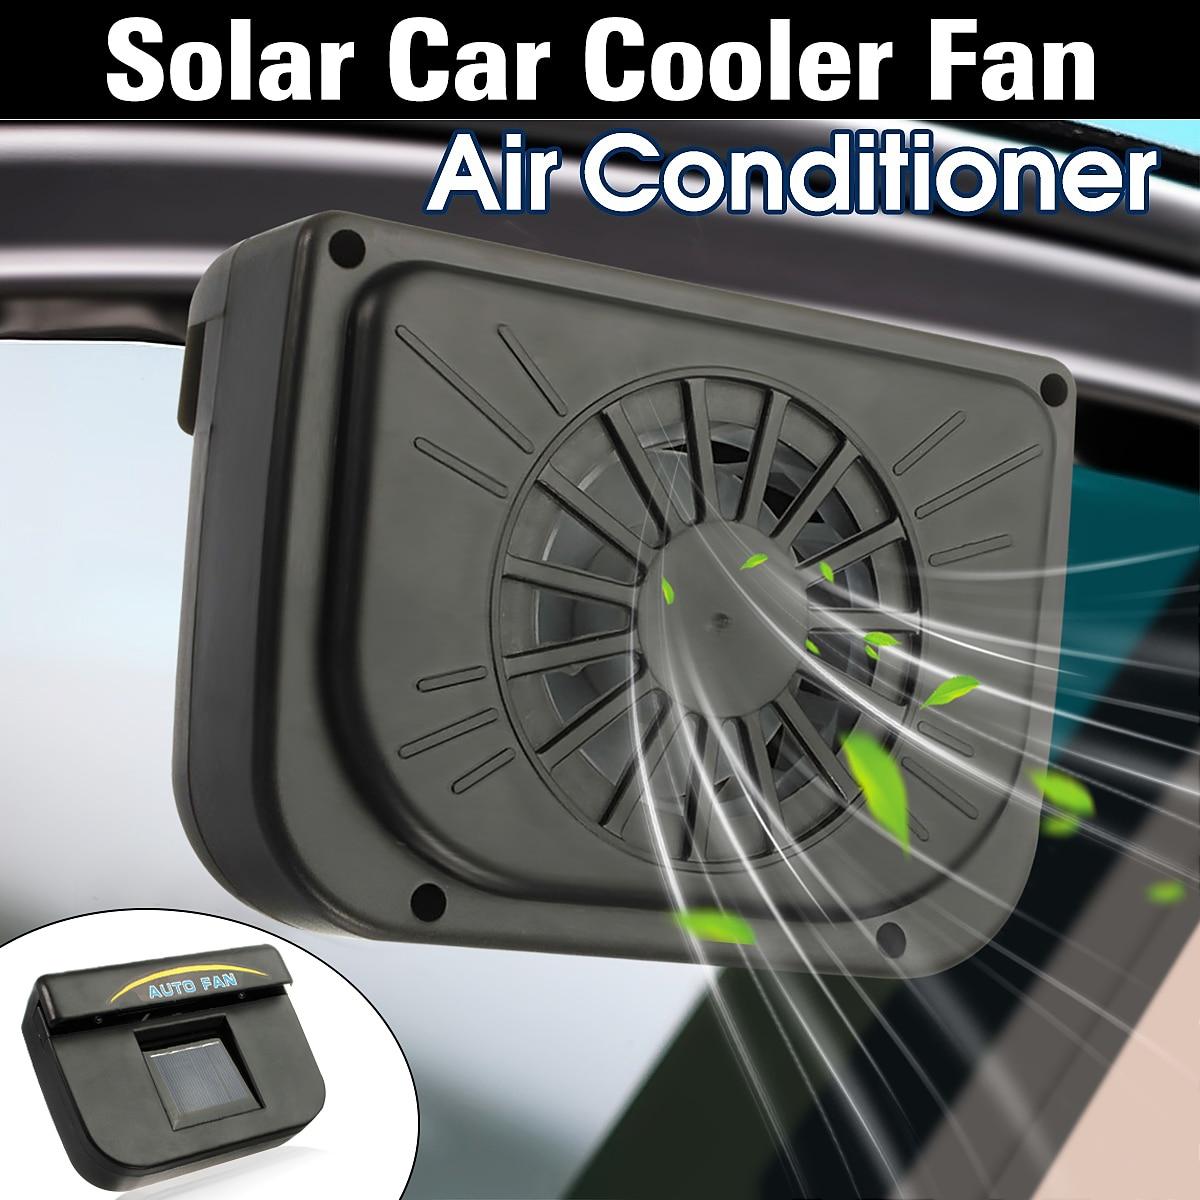 Solar Ventana de coche Vent ventiladores fresco ventilador enfriador radiador del sistema